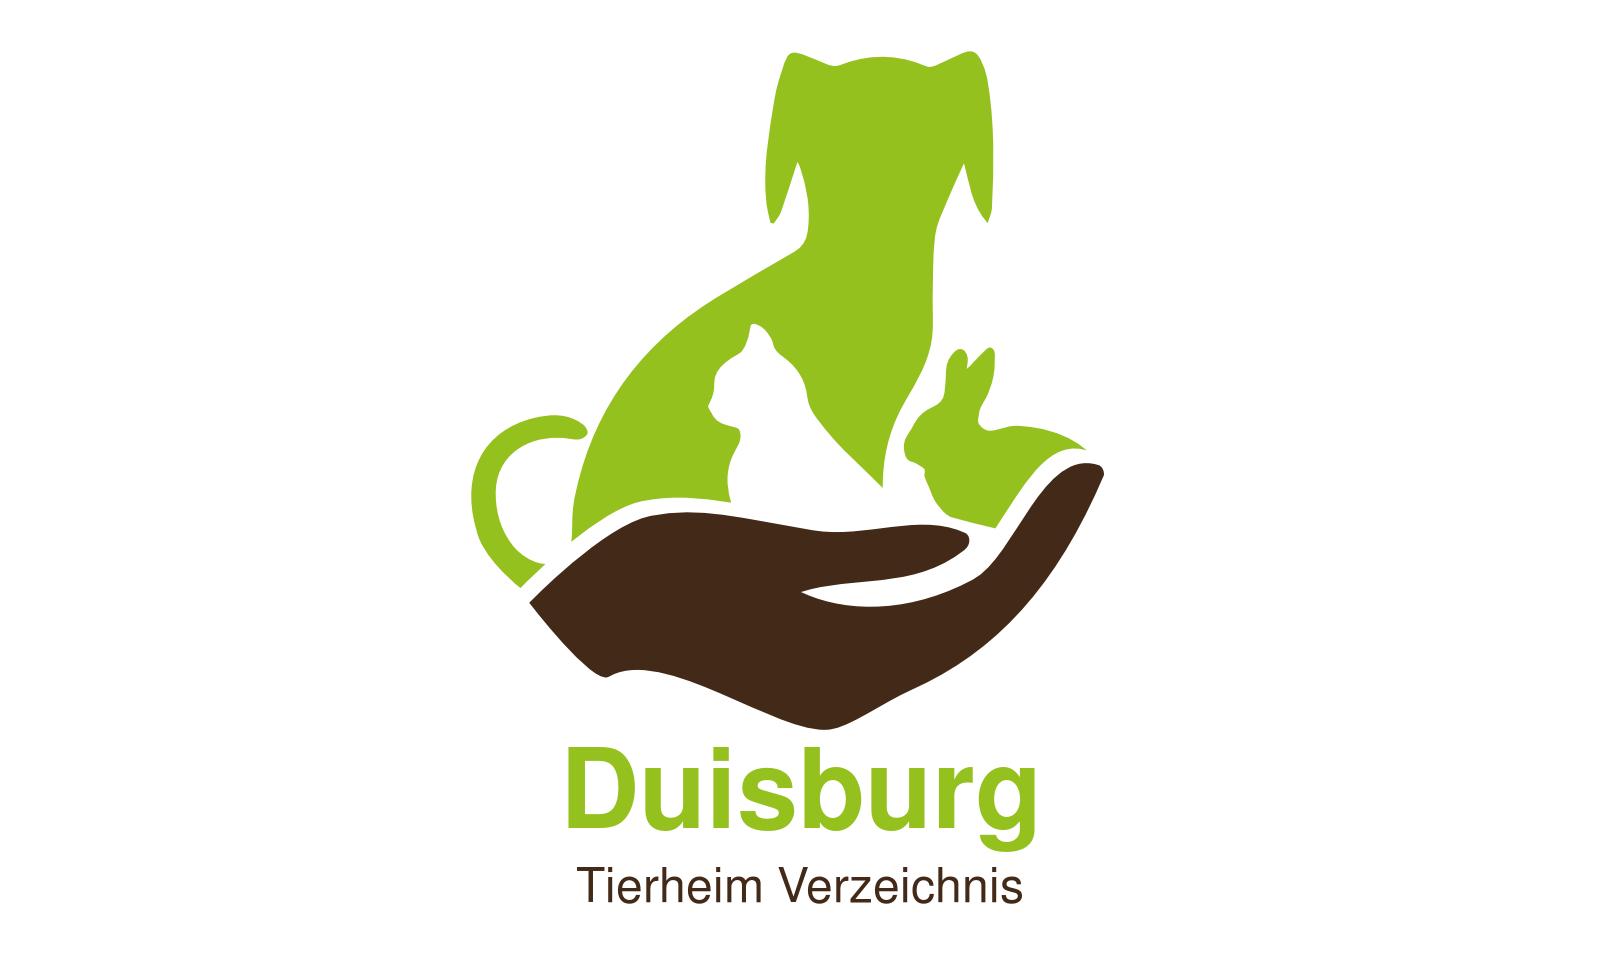 Tierheim Duisburg